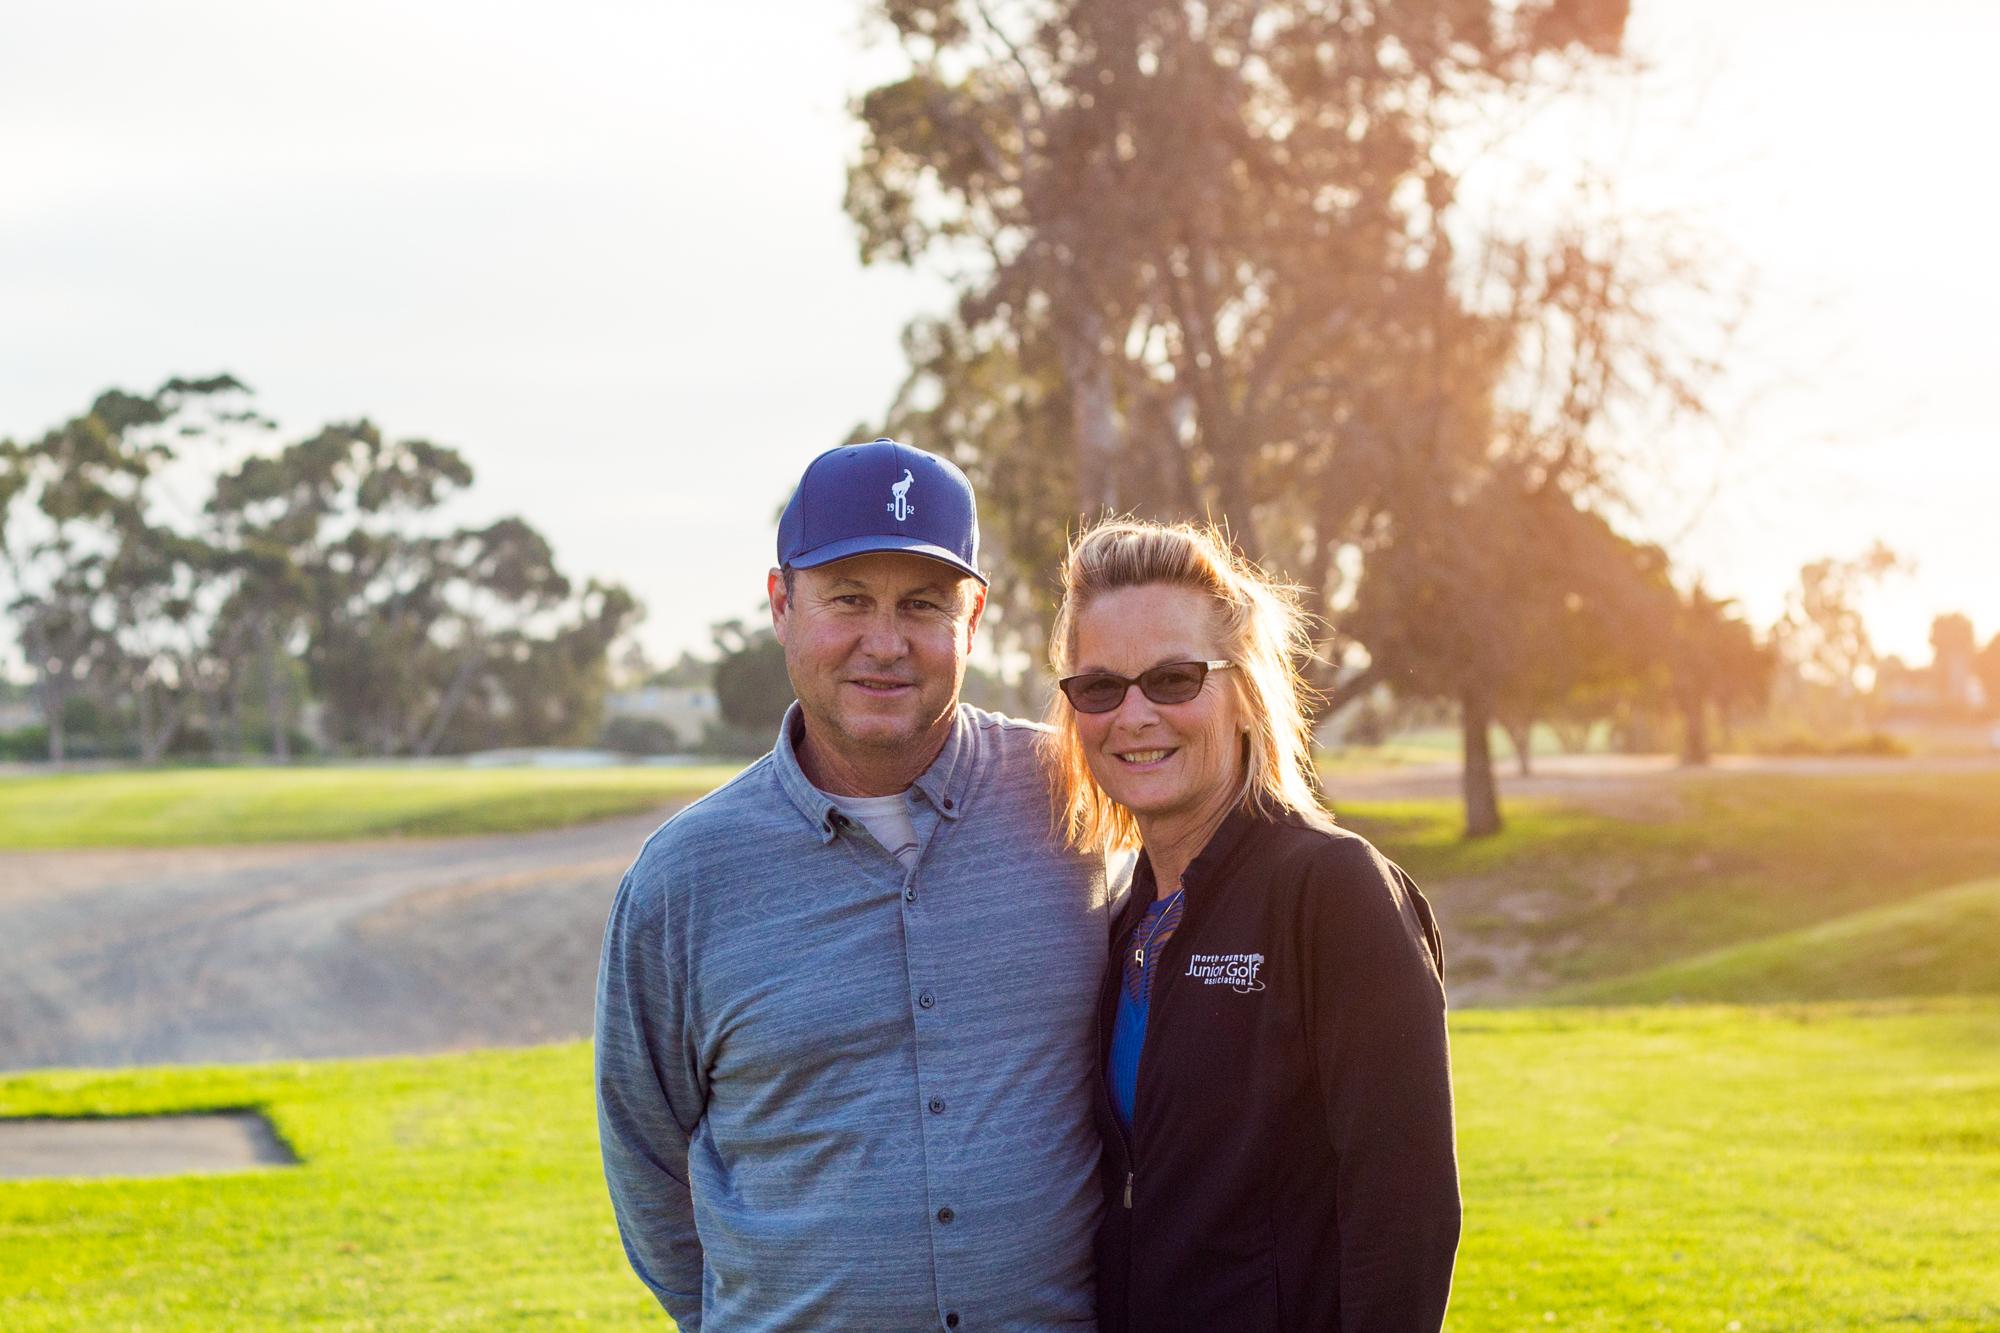 Dave & Marcia Emerick, founders of the NCJGA